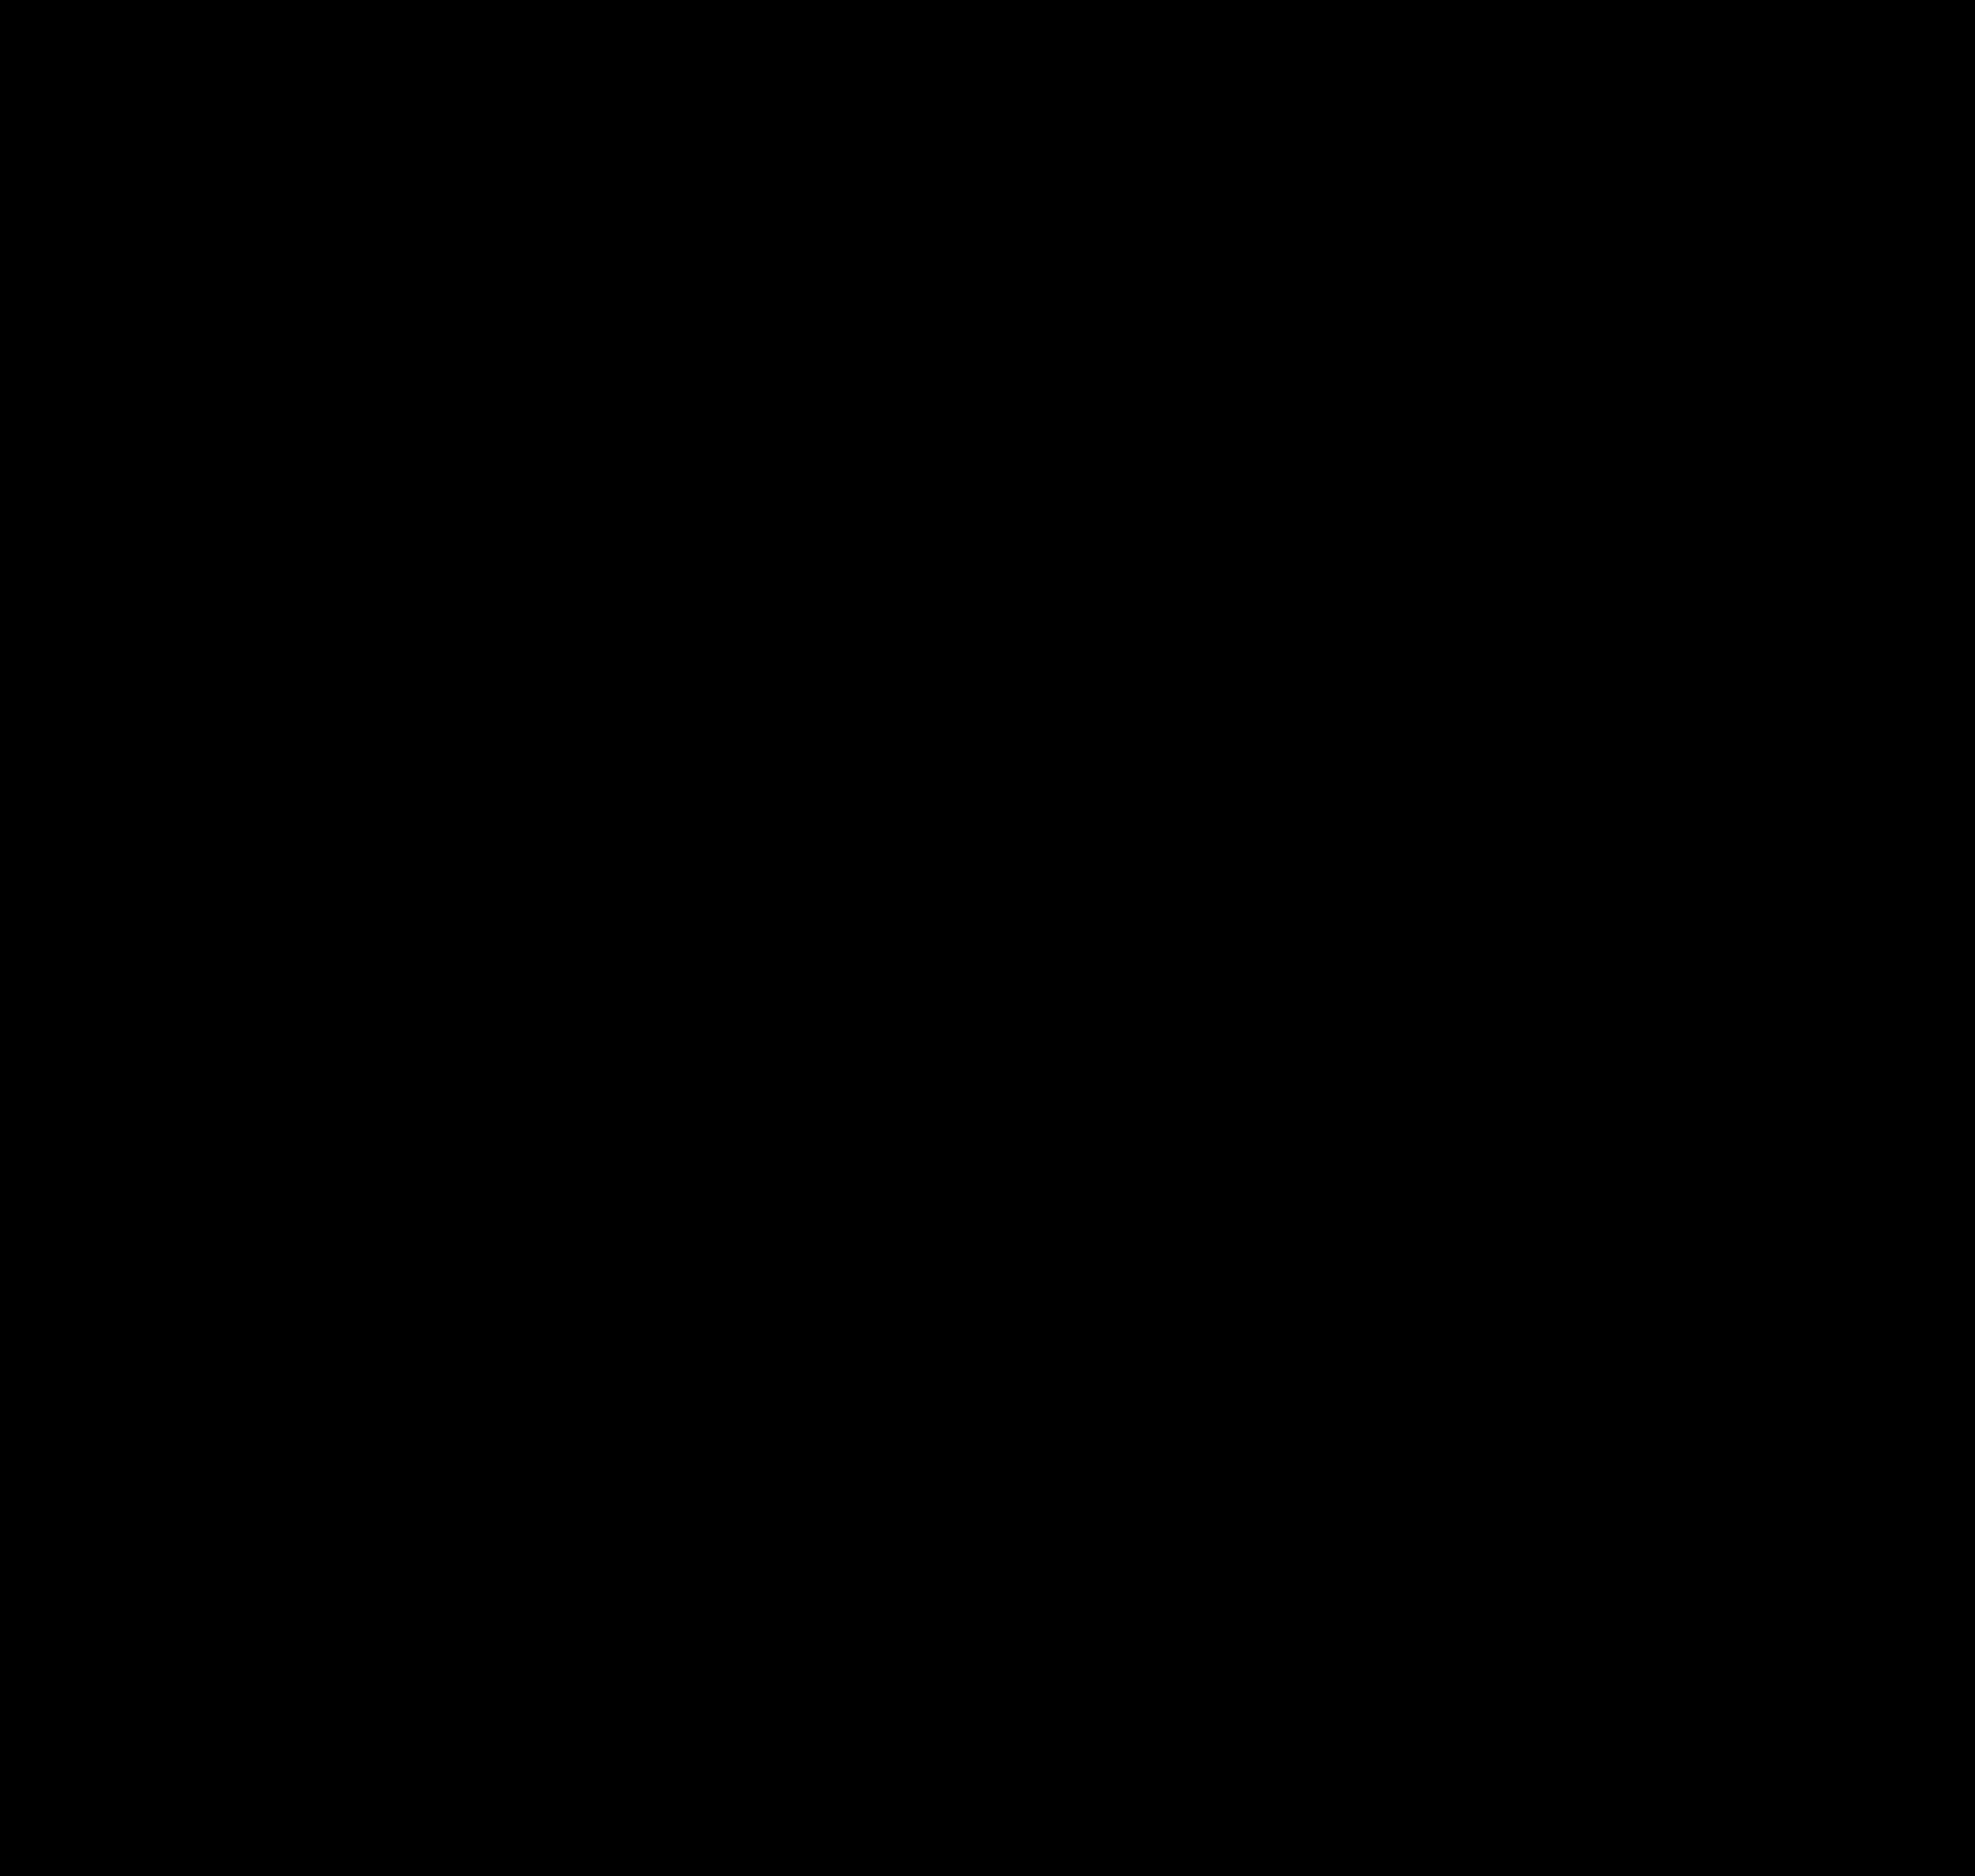 Wurzelbrot